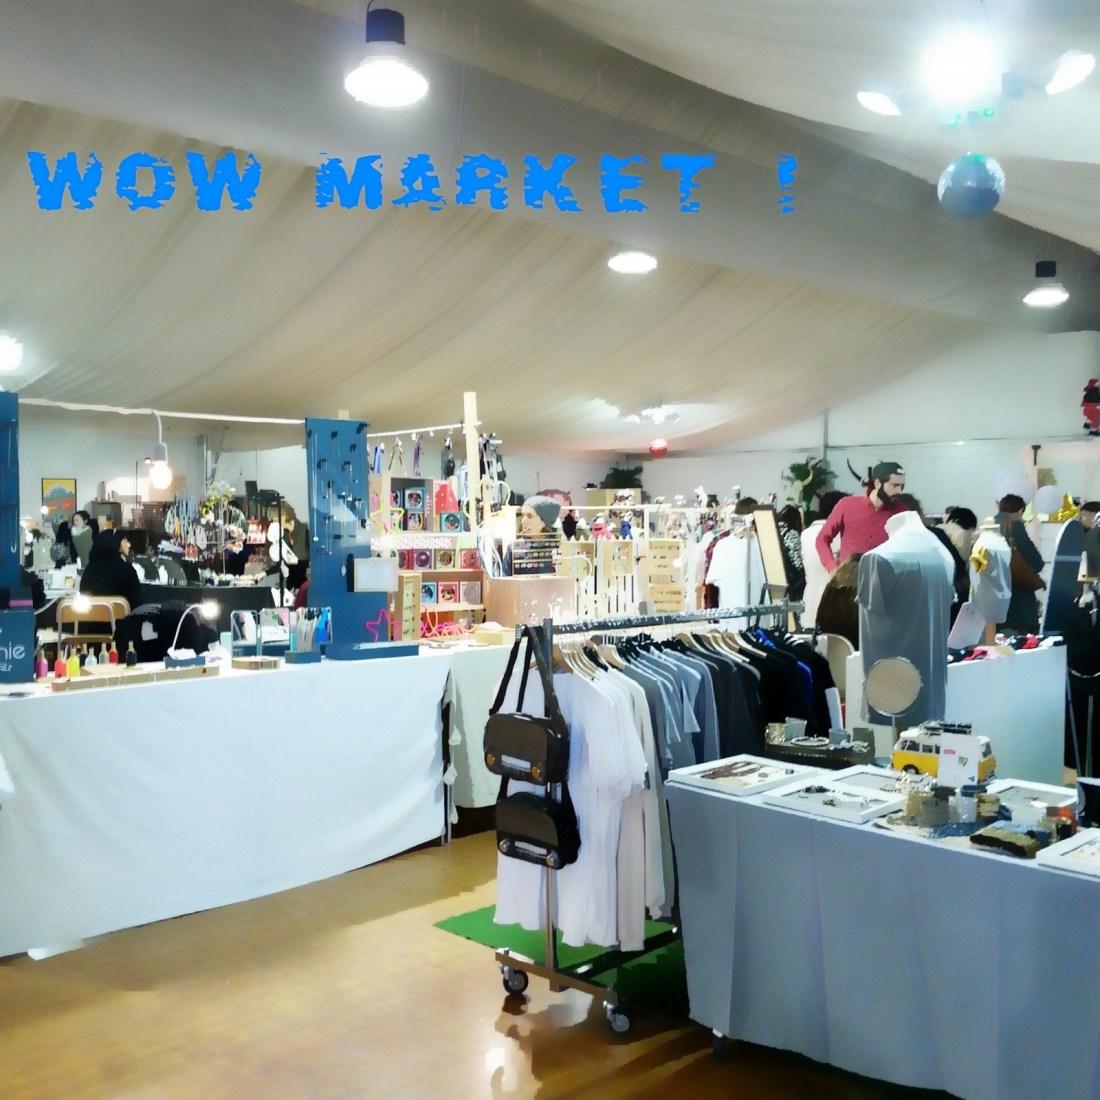 WOW market